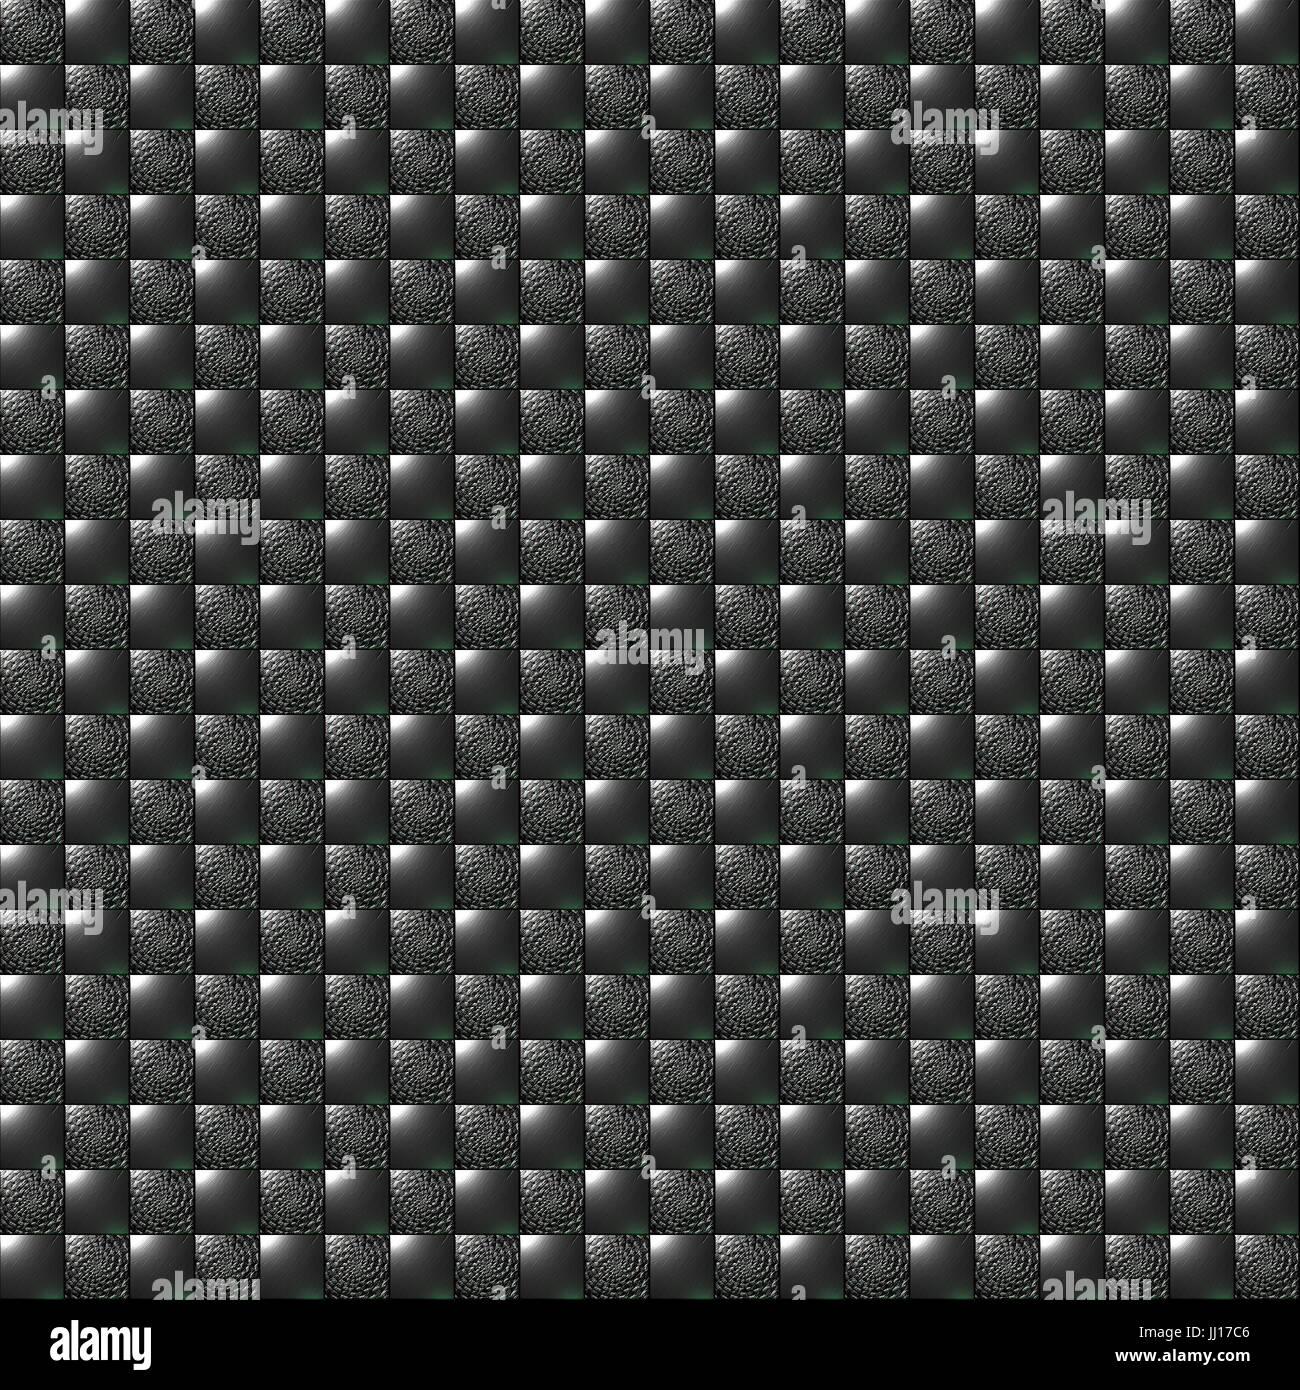 Checkerboard Pattern Stock Photos & Checkerboard Pattern